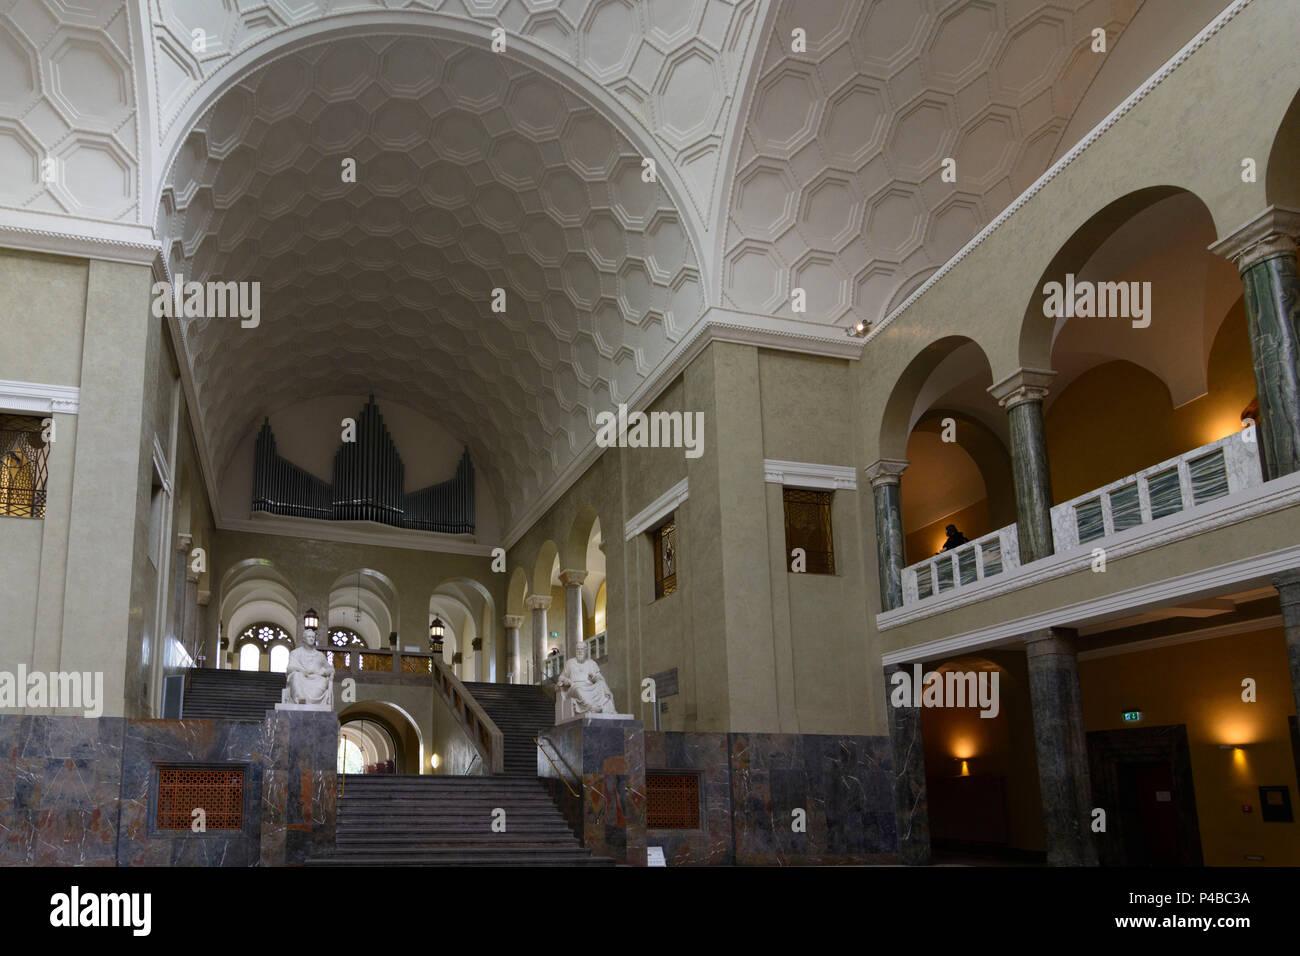 München, Munich, Ludwig-Maximilians-Universität (University), stairwell, Upper Bavaria, Bavaria, Germany - Stock Image